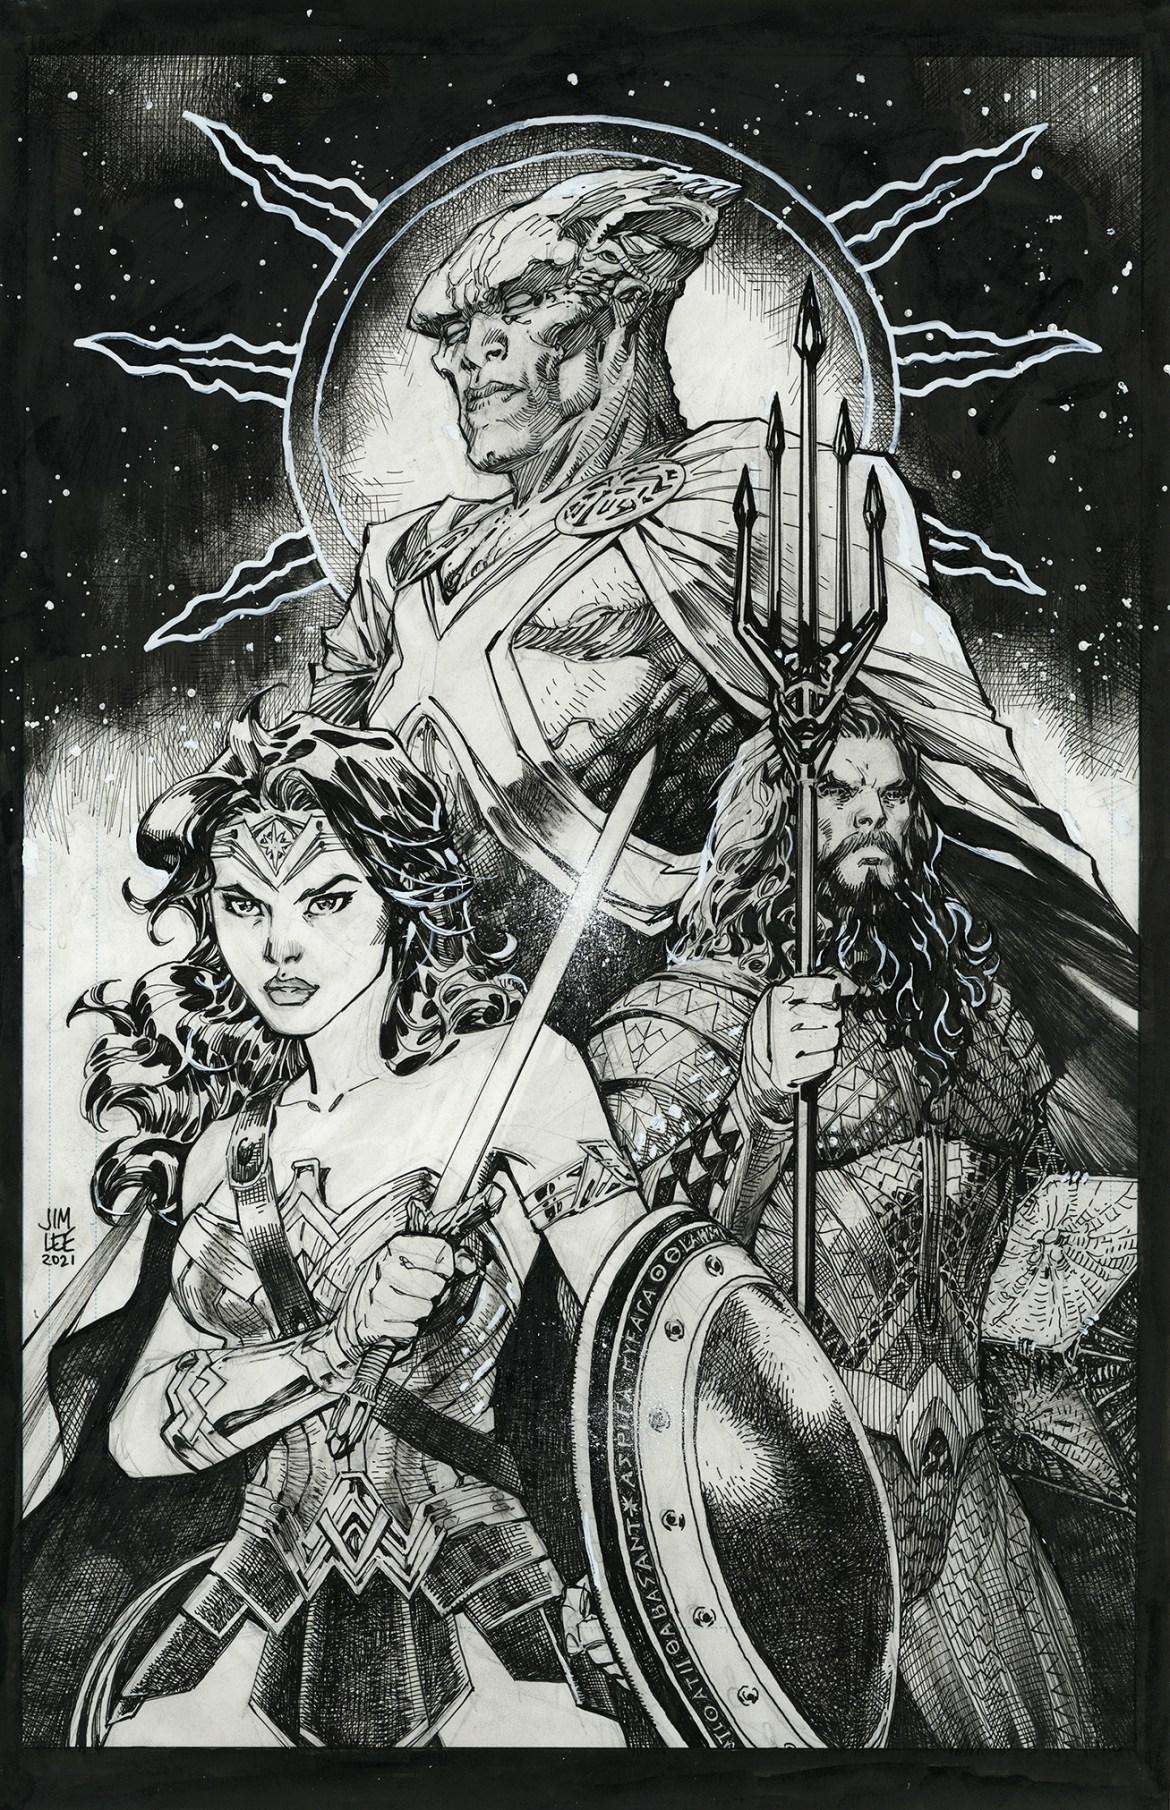 0121DC839 ComicList: DC Comics New Releases for 03/17/2021